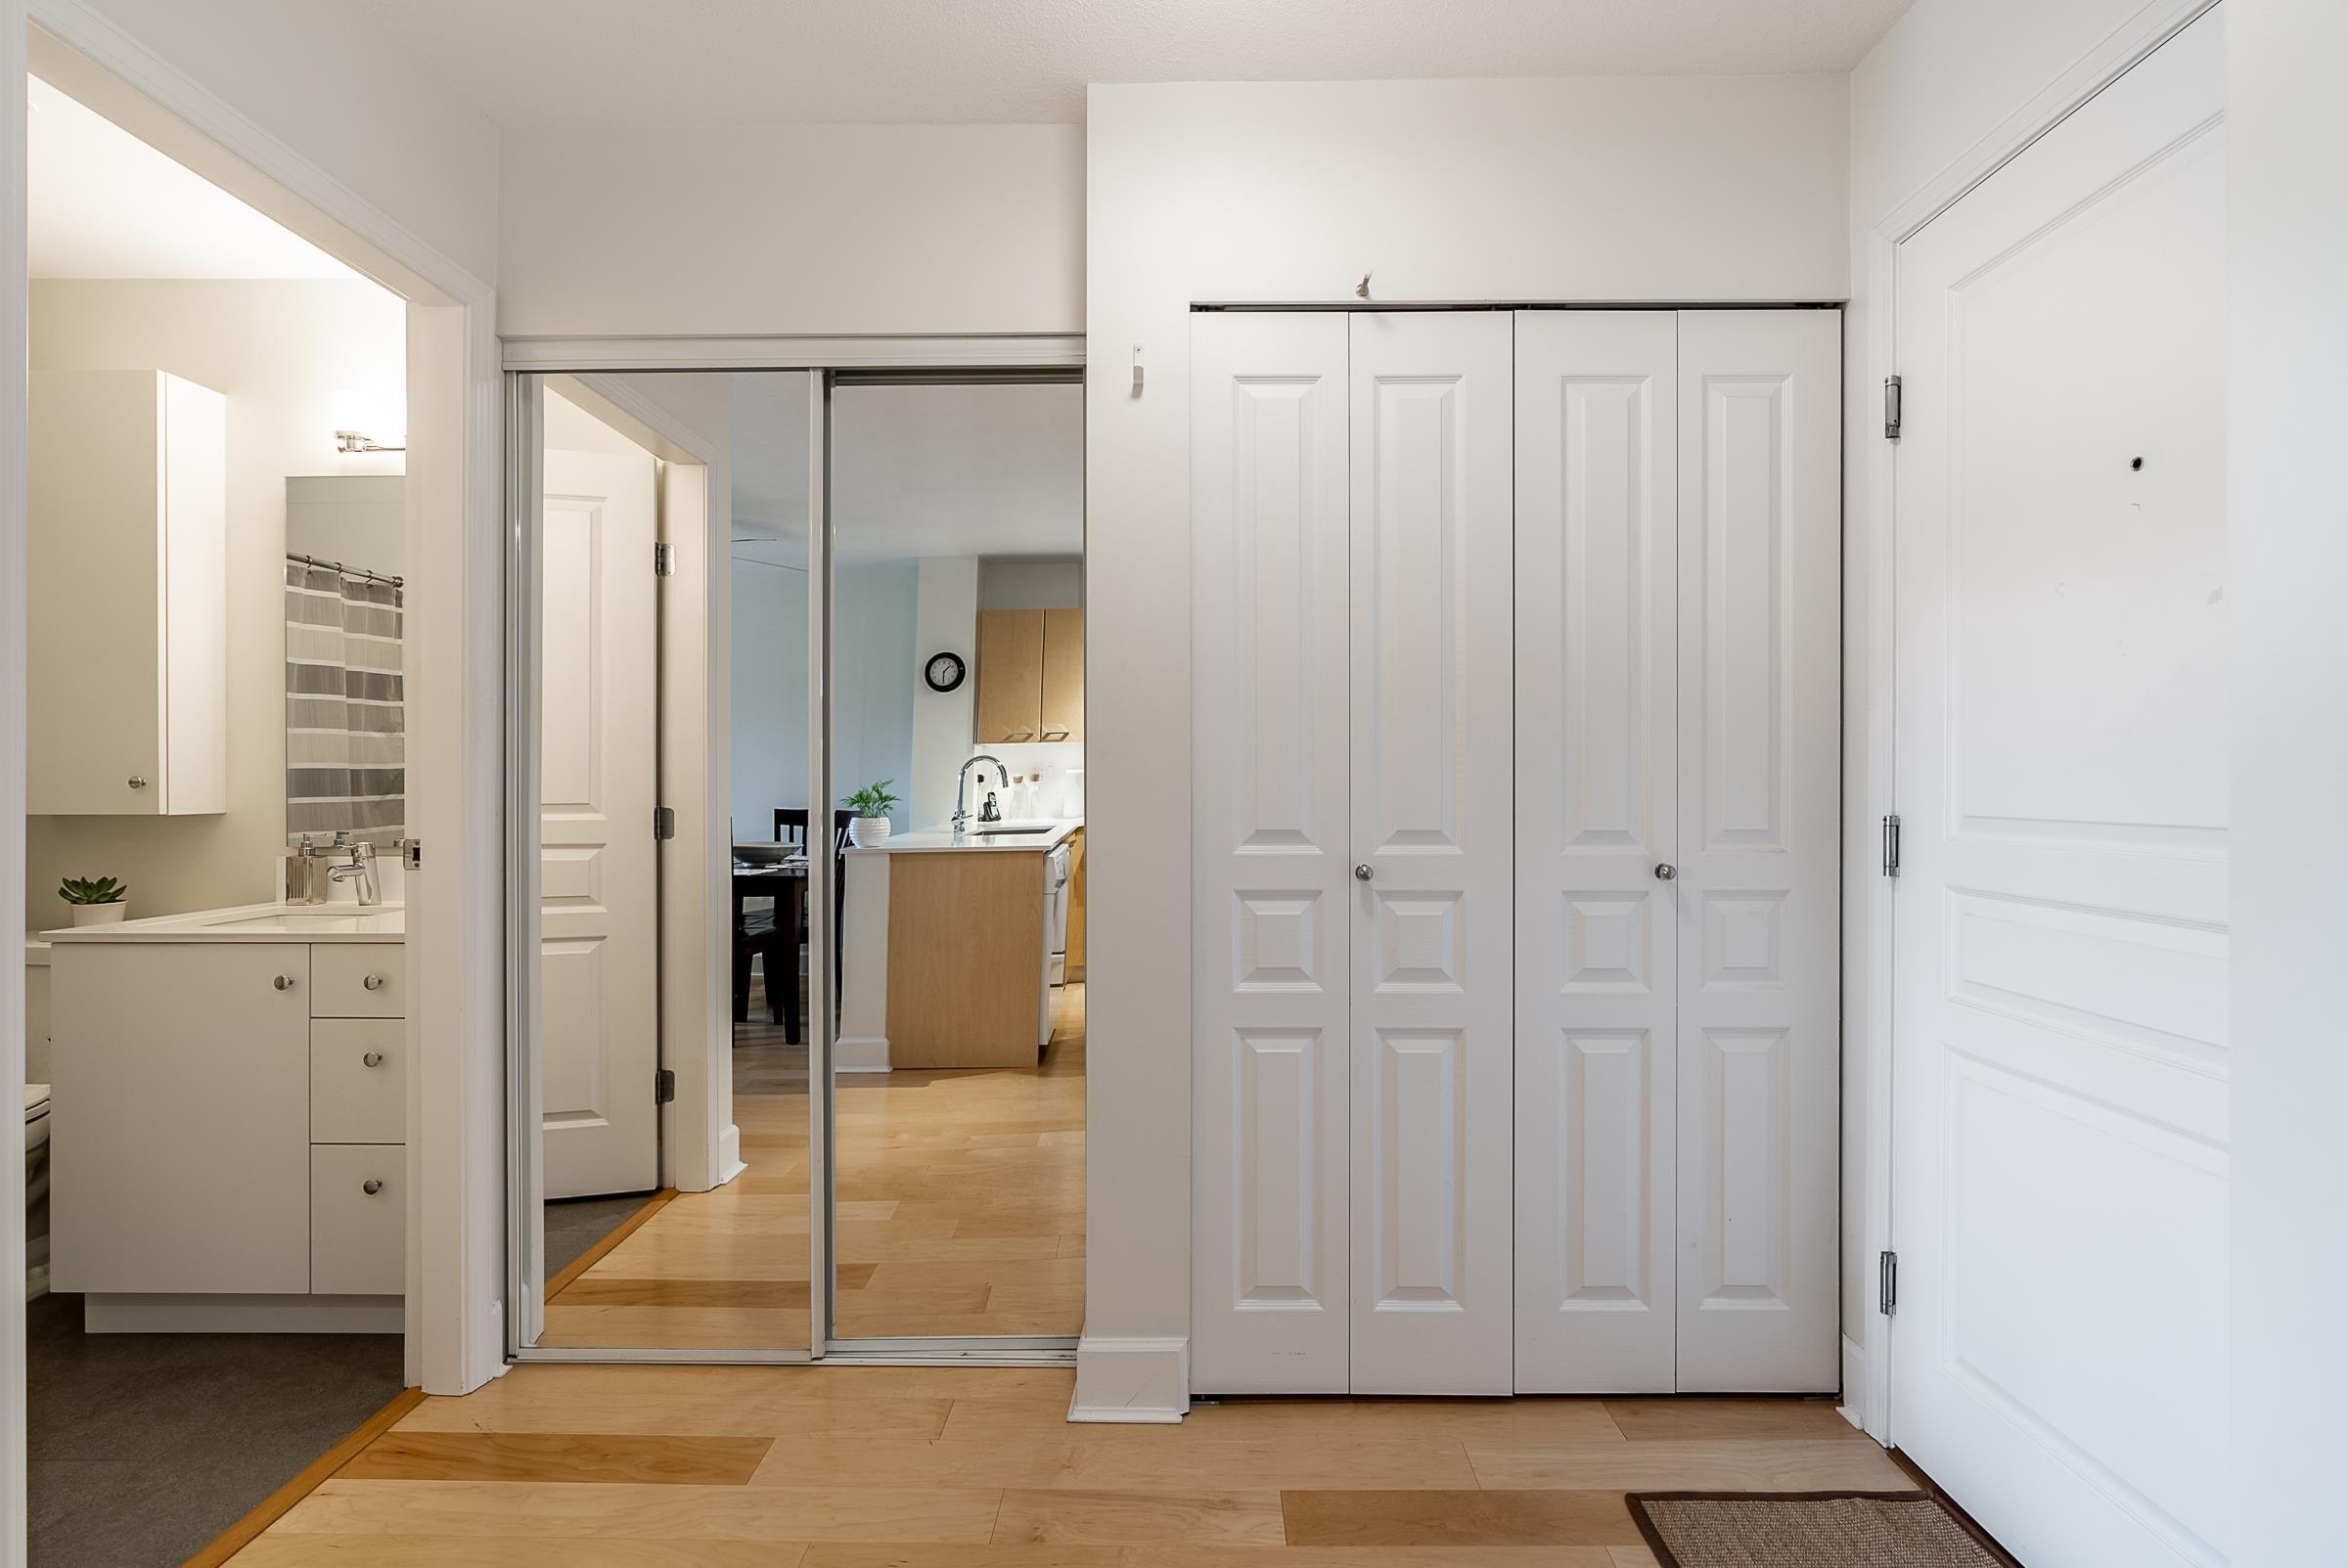 406 1989 DUNBAR STREET - Kitsilano Apartment/Condo for sale, 1 Bedroom (R2624949) - #14